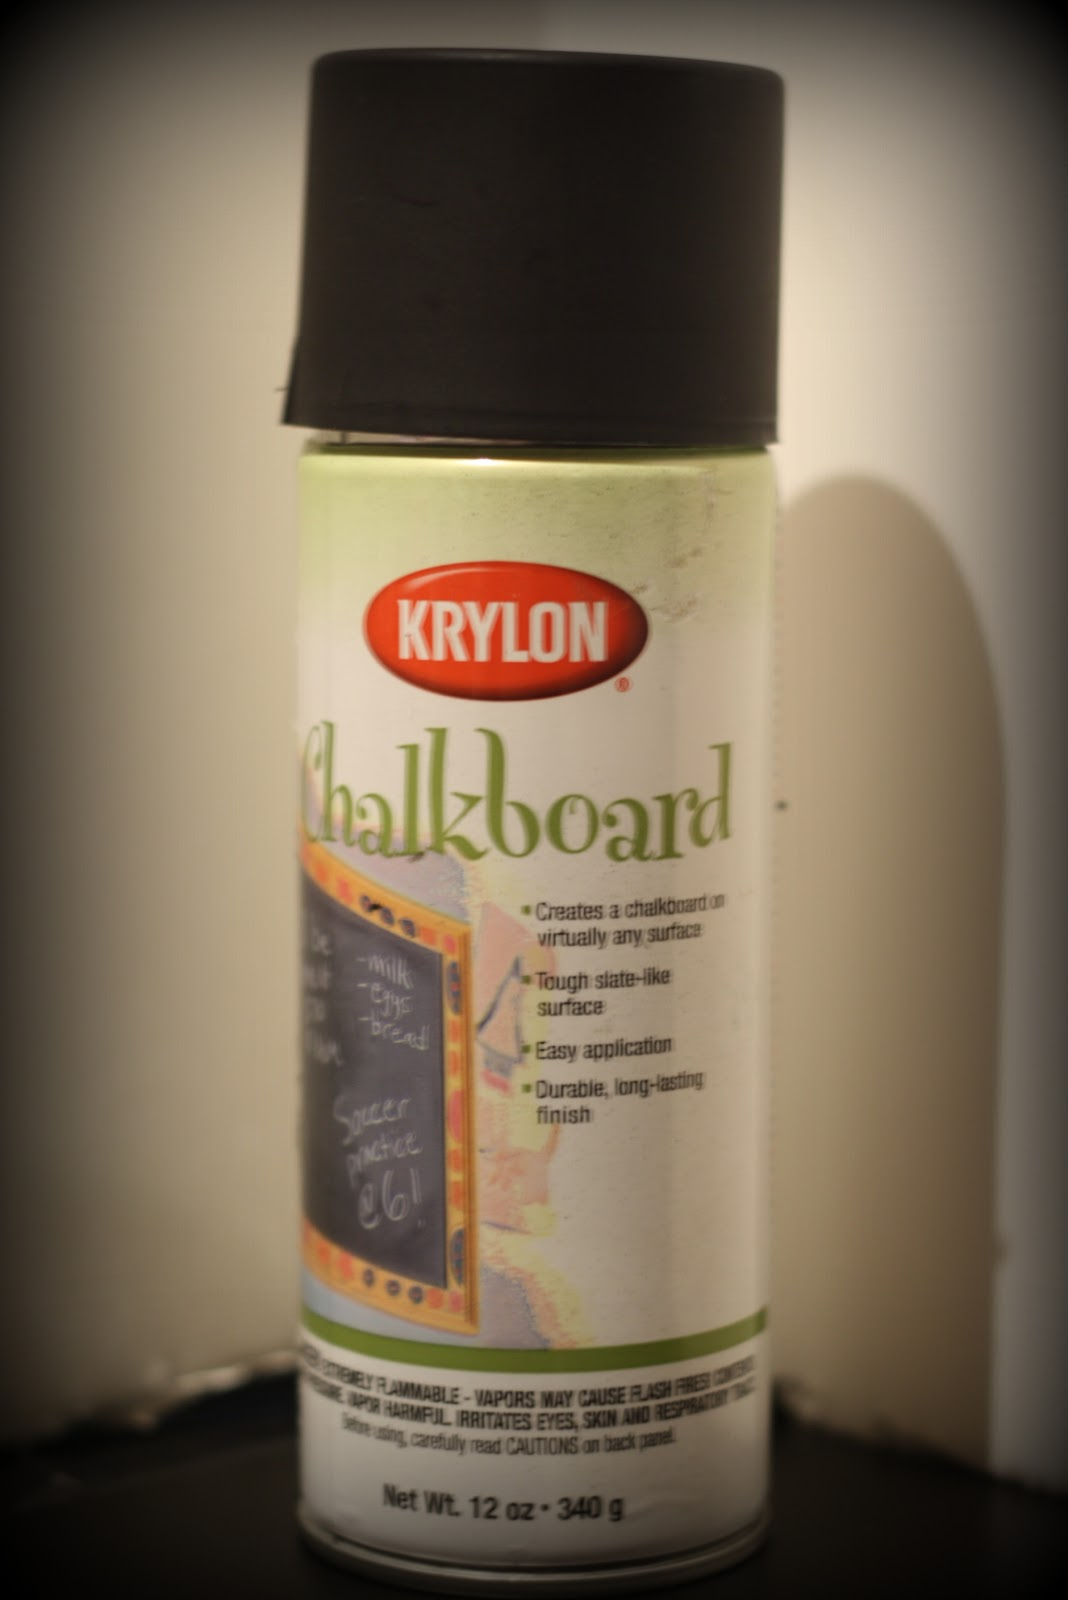 can of krylon chalkboard spray paint. Black Bedroom Furniture Sets. Home Design Ideas